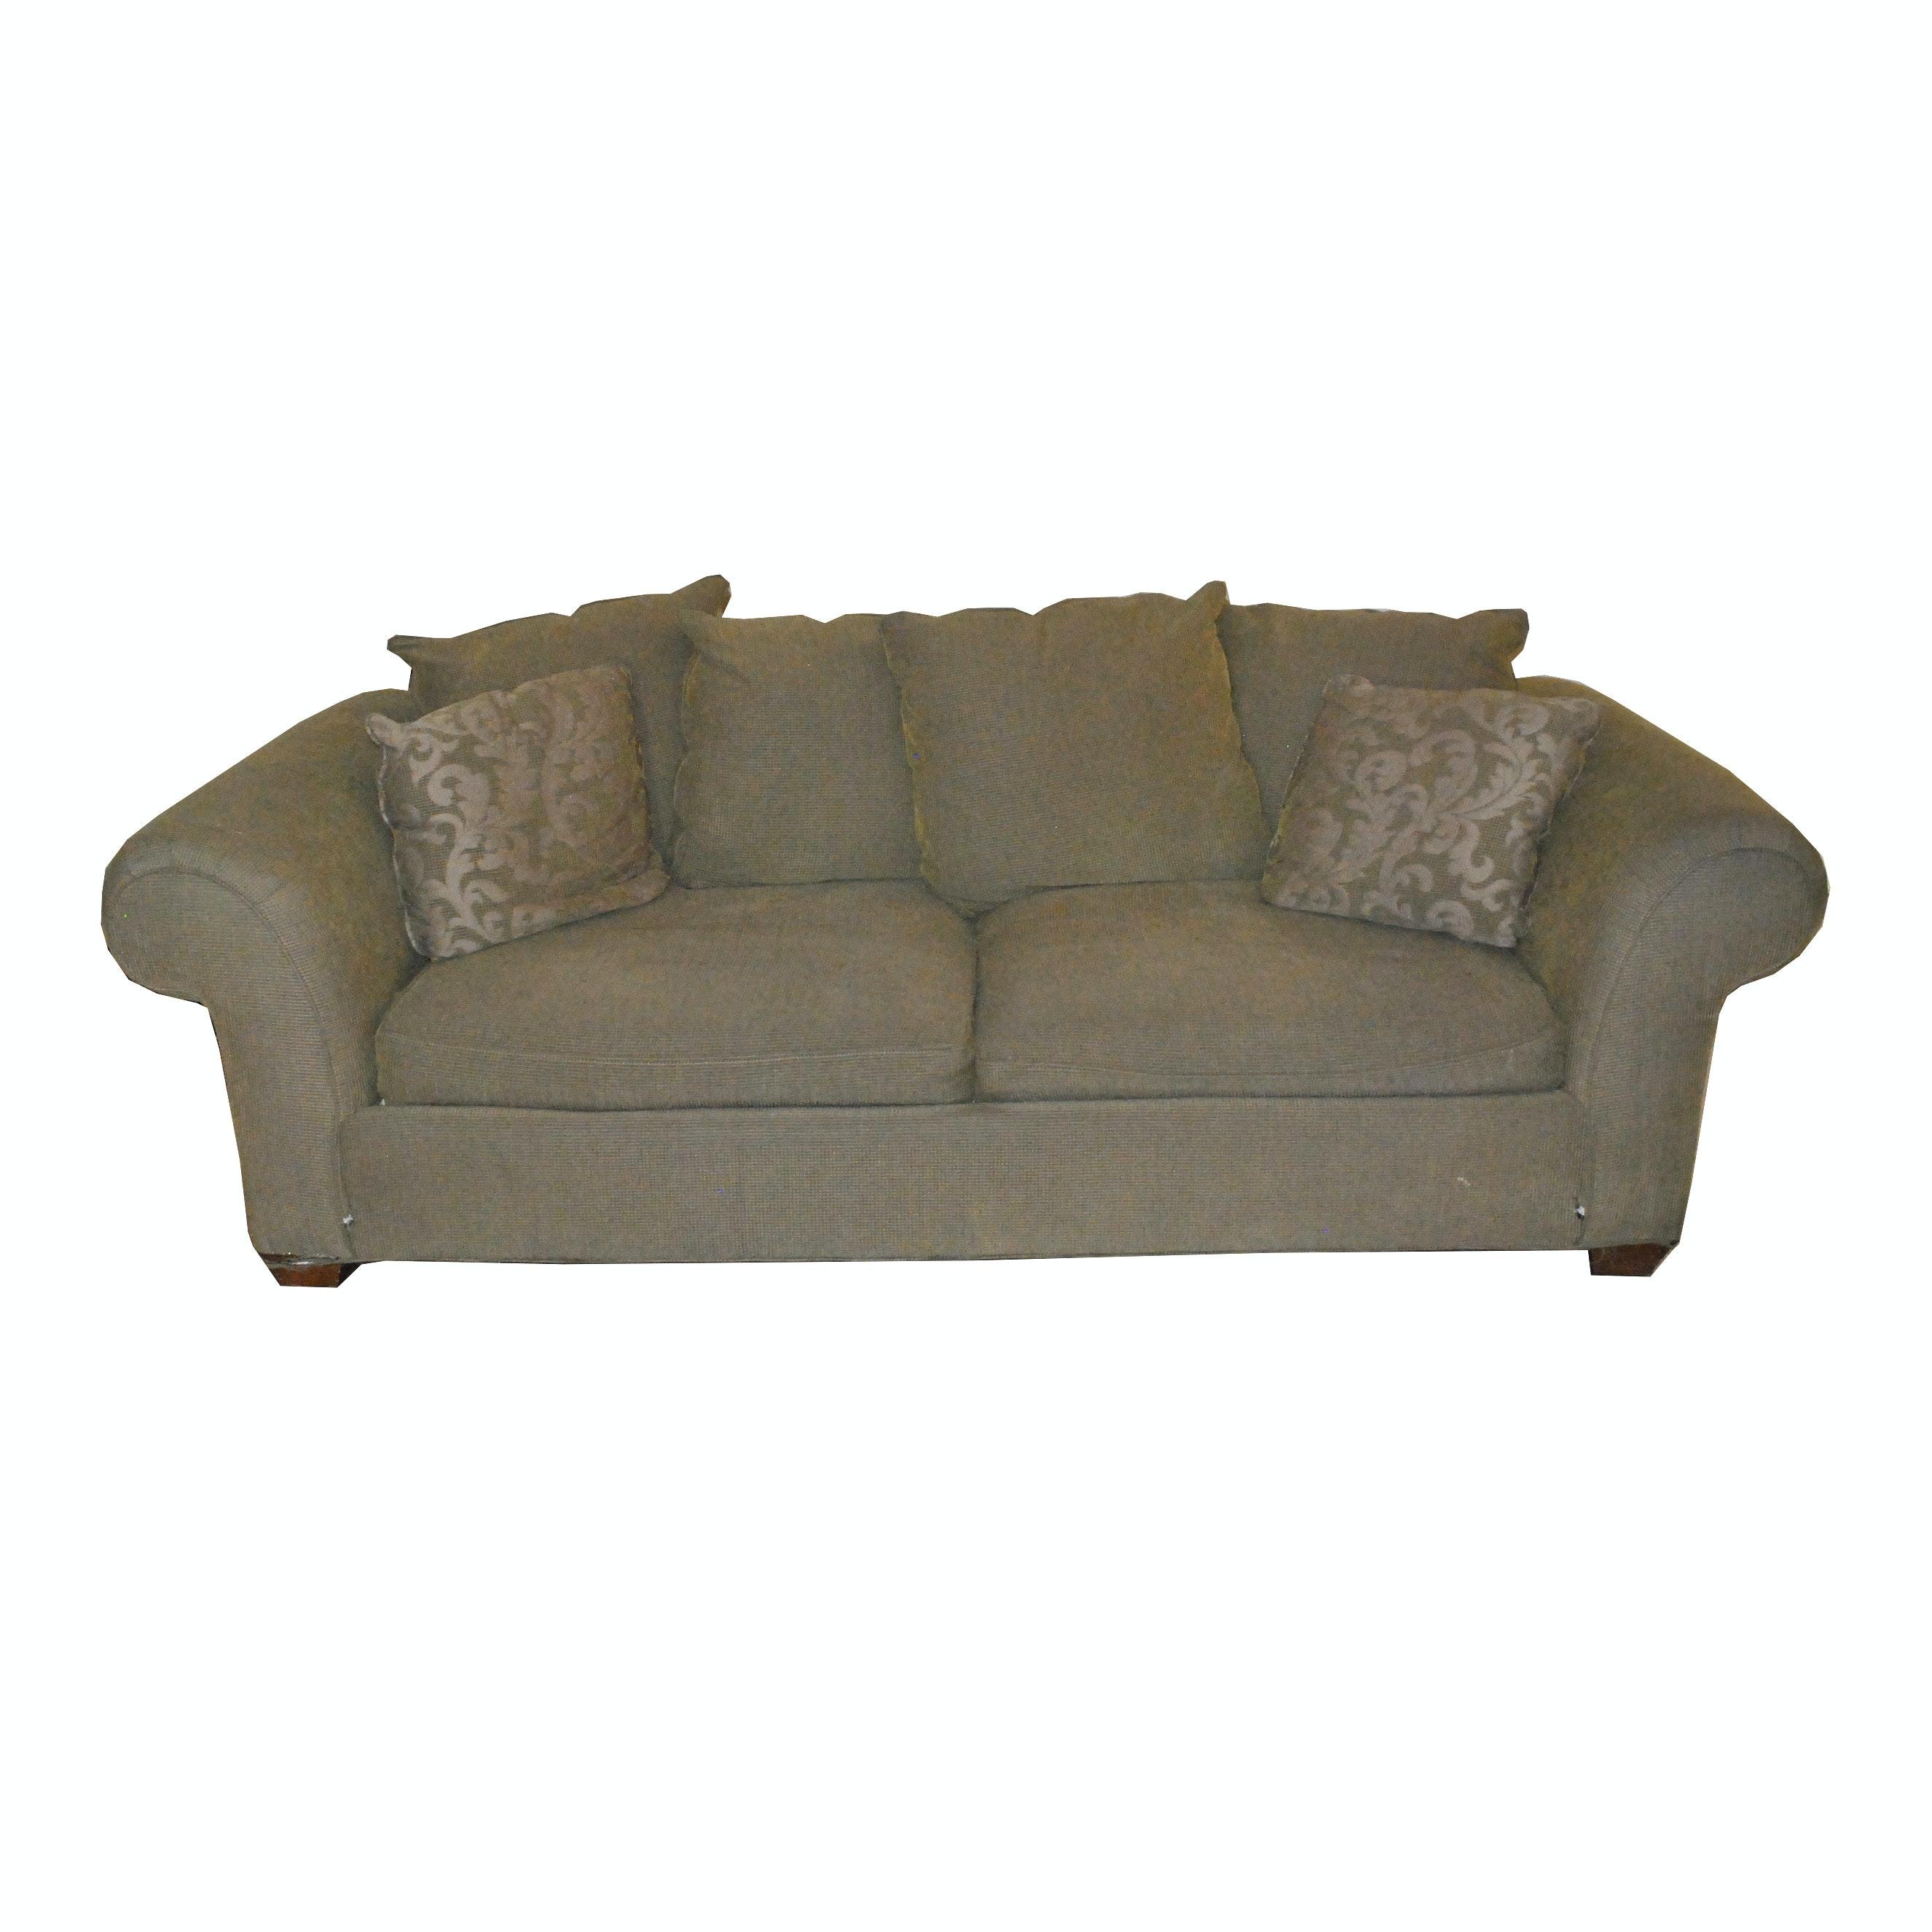 Modern Style Upholstered Sofa